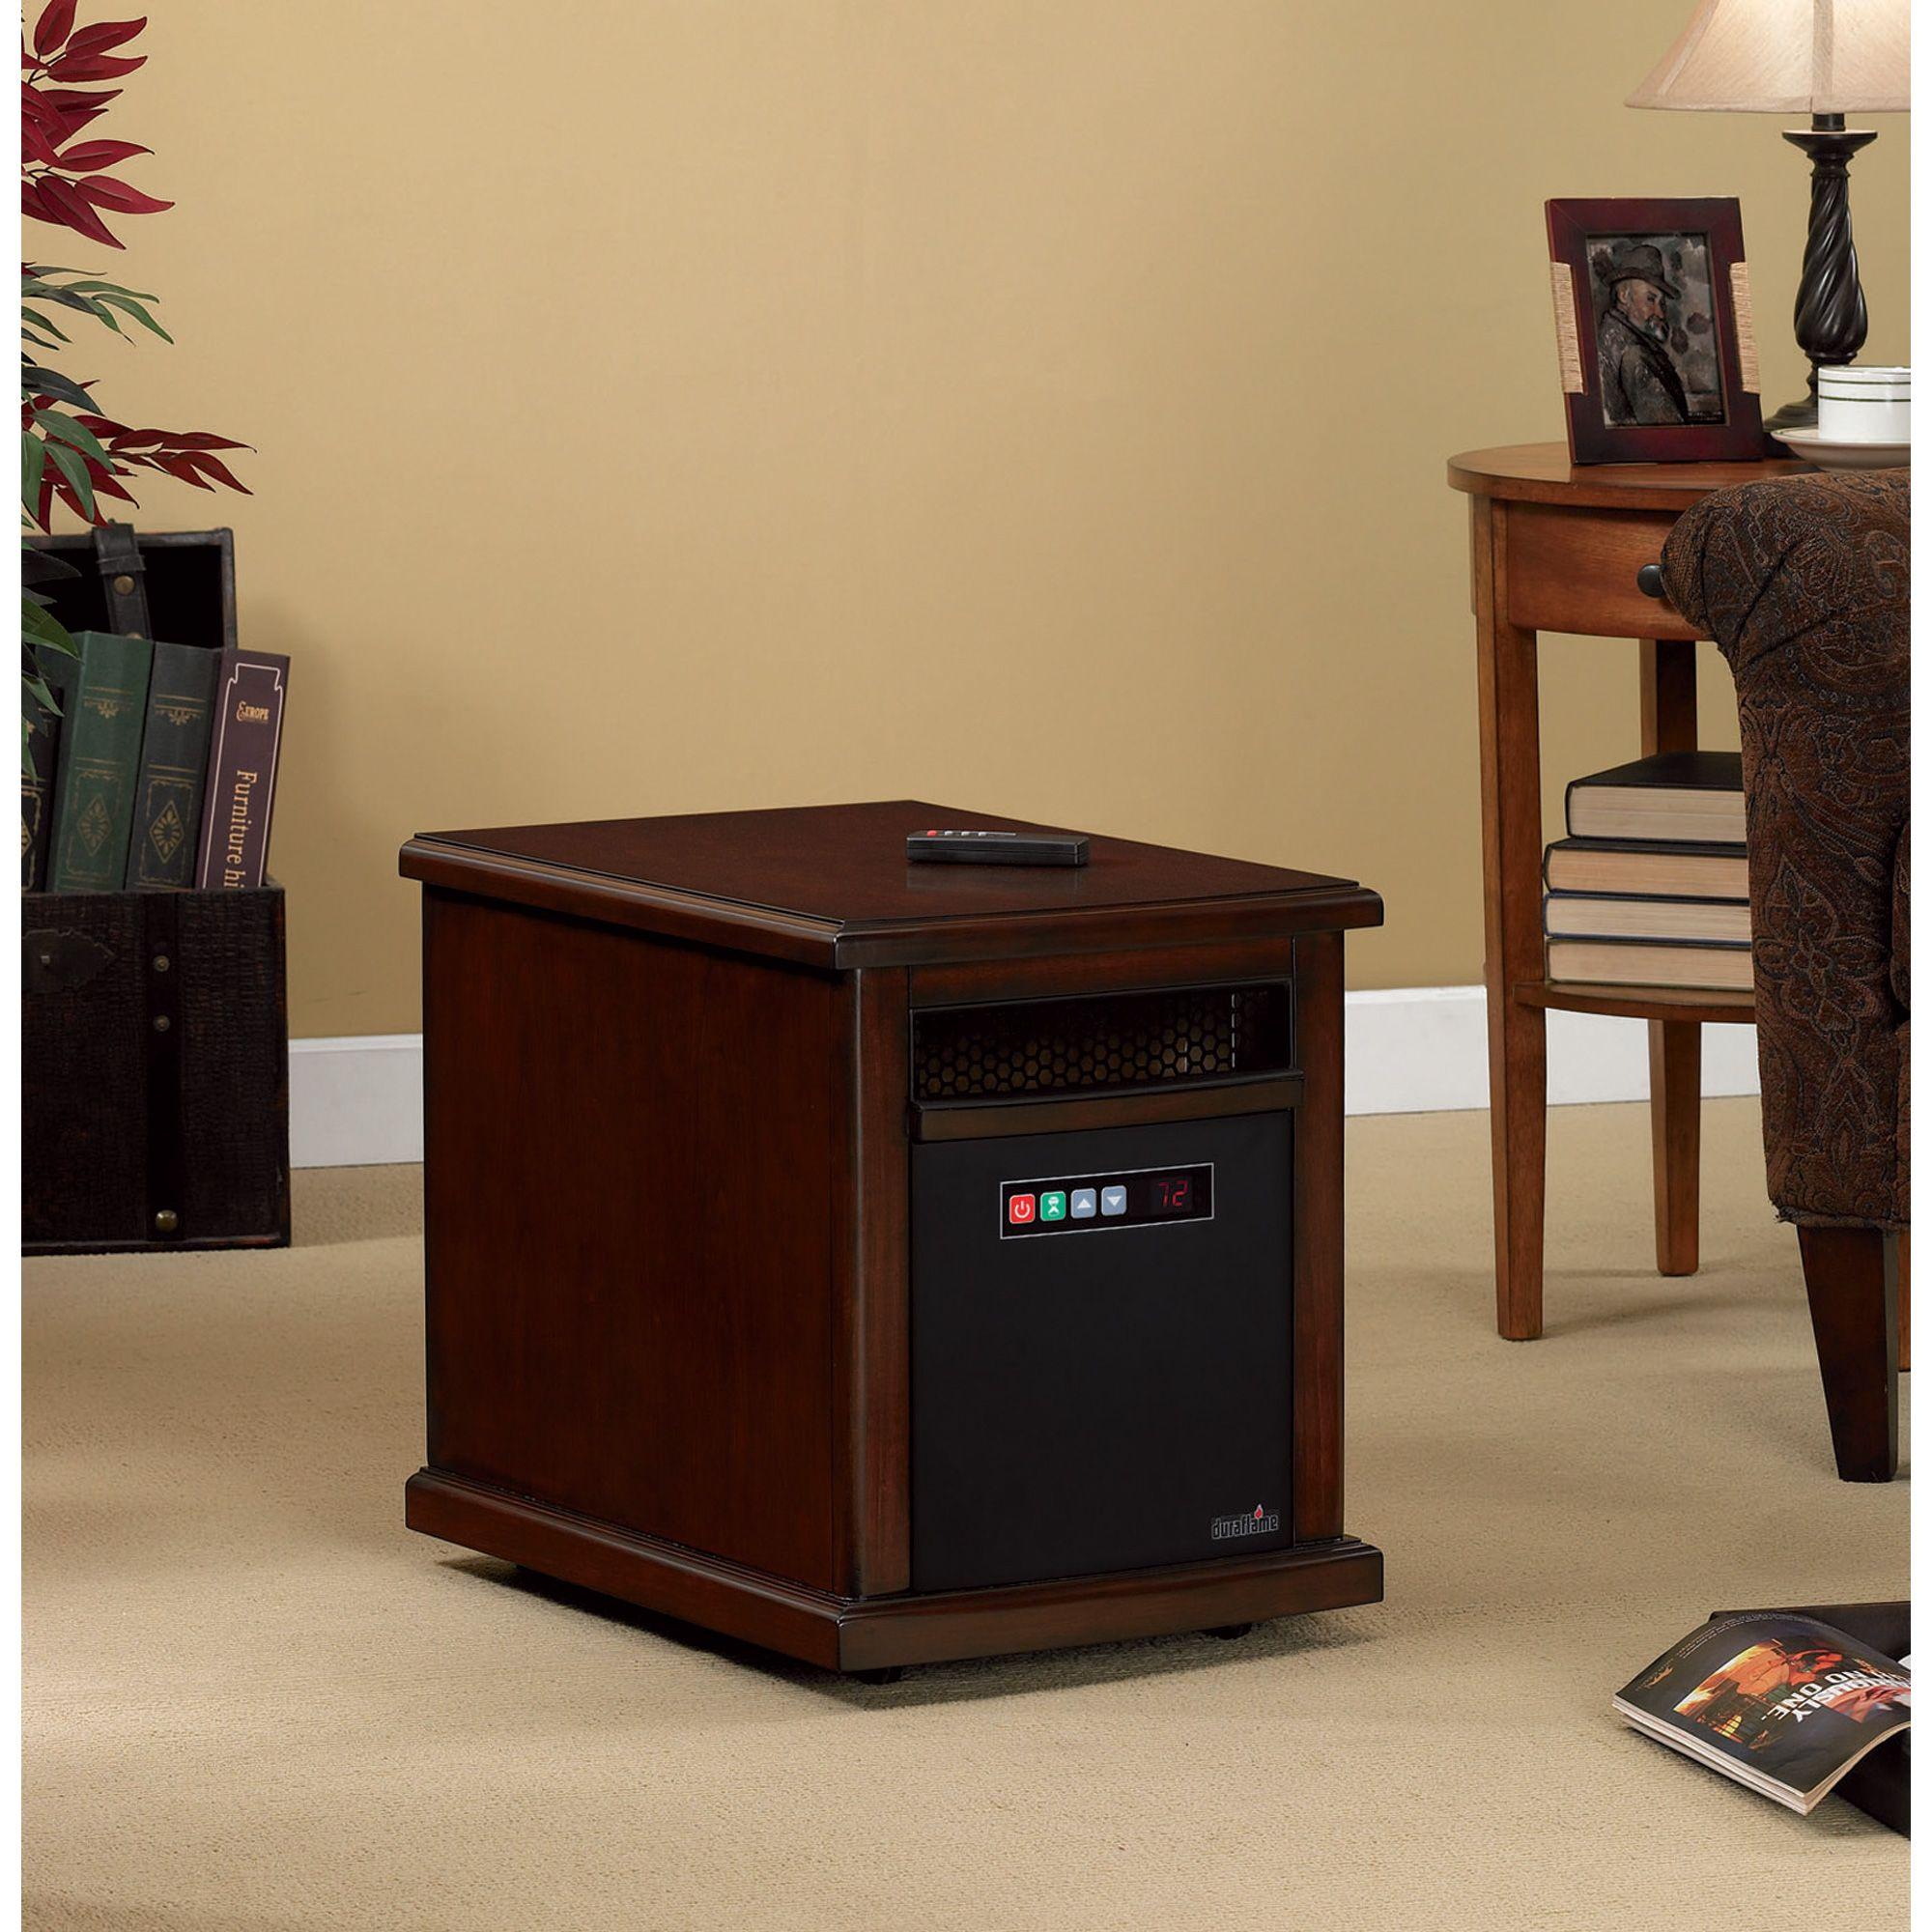 Duraflame PowerHeat Infrared Quartz Heater brings comfortable ...